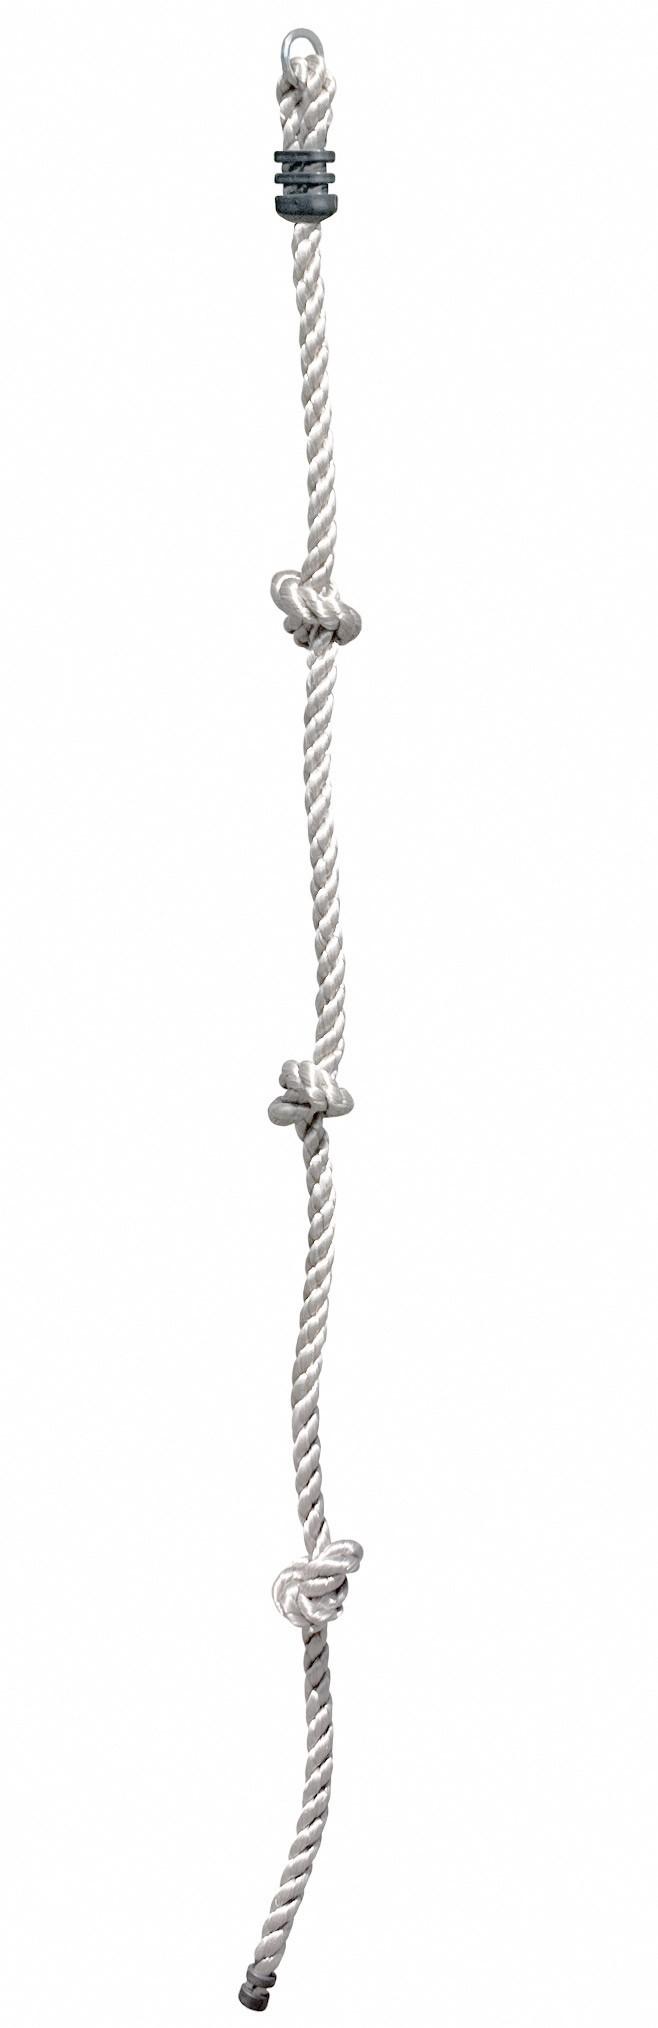 Kletterseil / Knotenseil mit 3 Knoten Multi-Play Bild 1